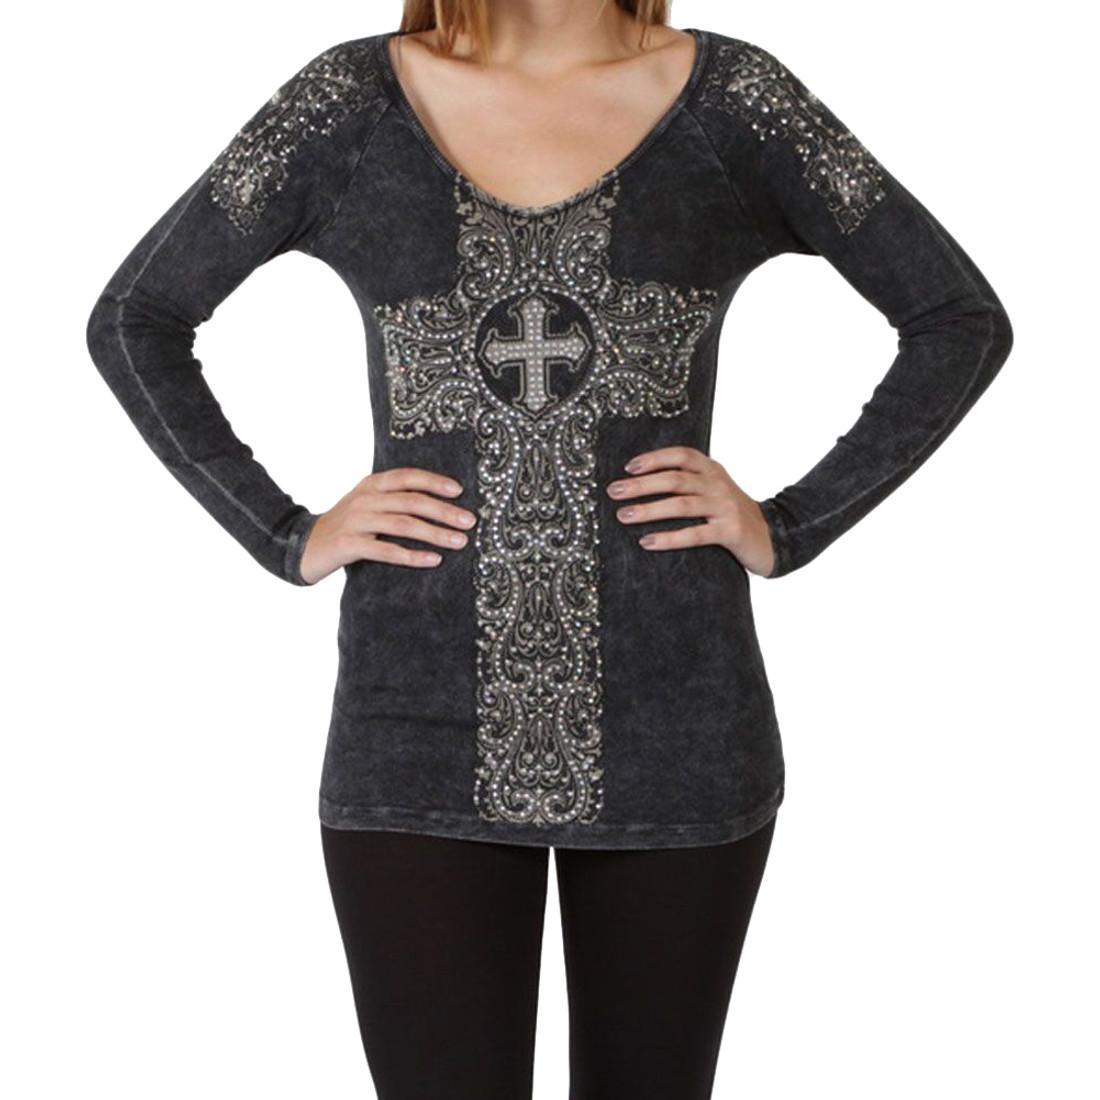 Vocal Apparel Black Long Sleeve Shirt